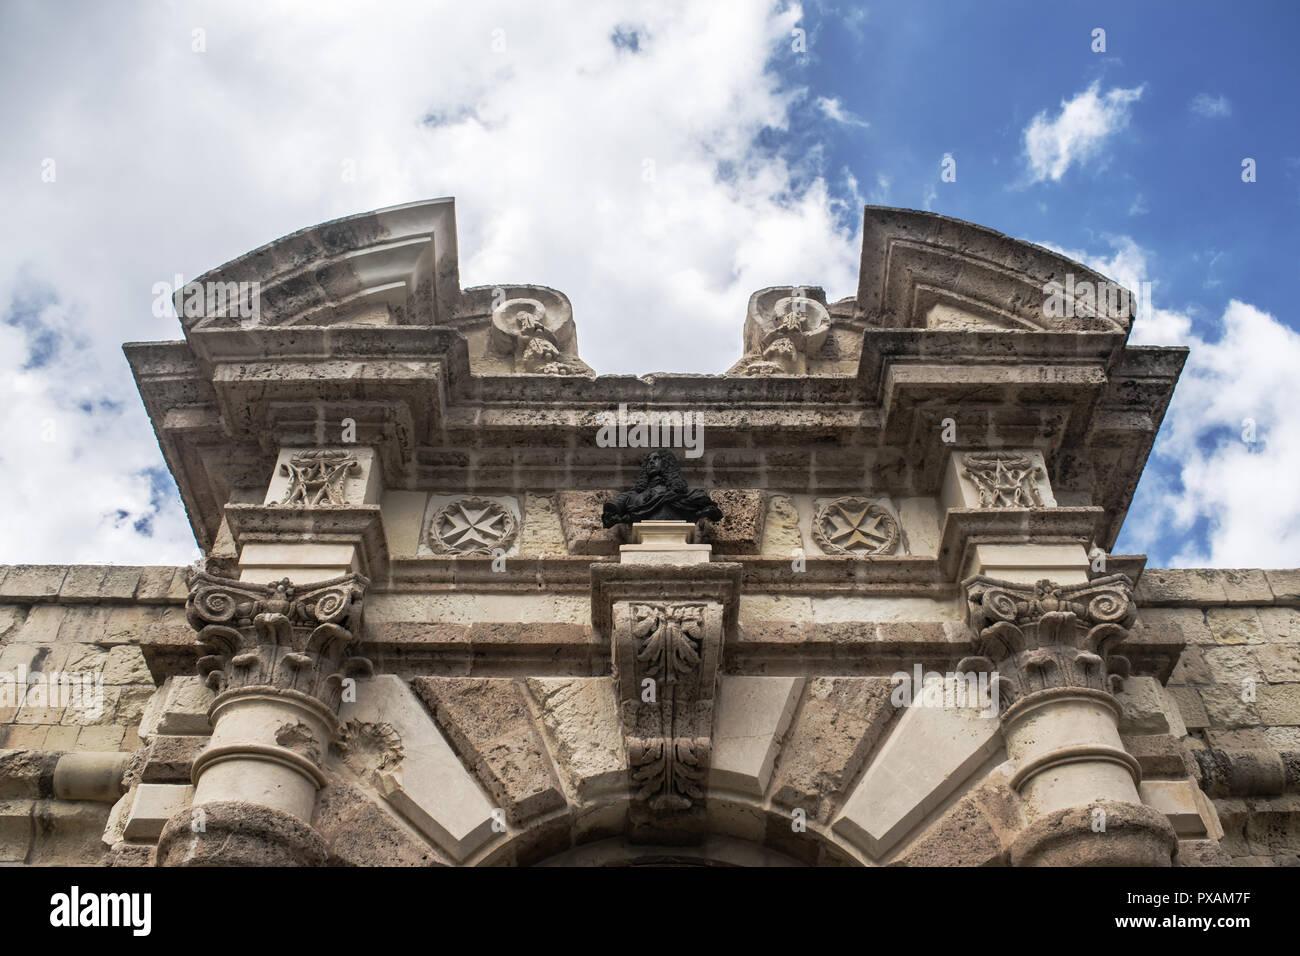 18th Century Gothic Architecture - Stock Image